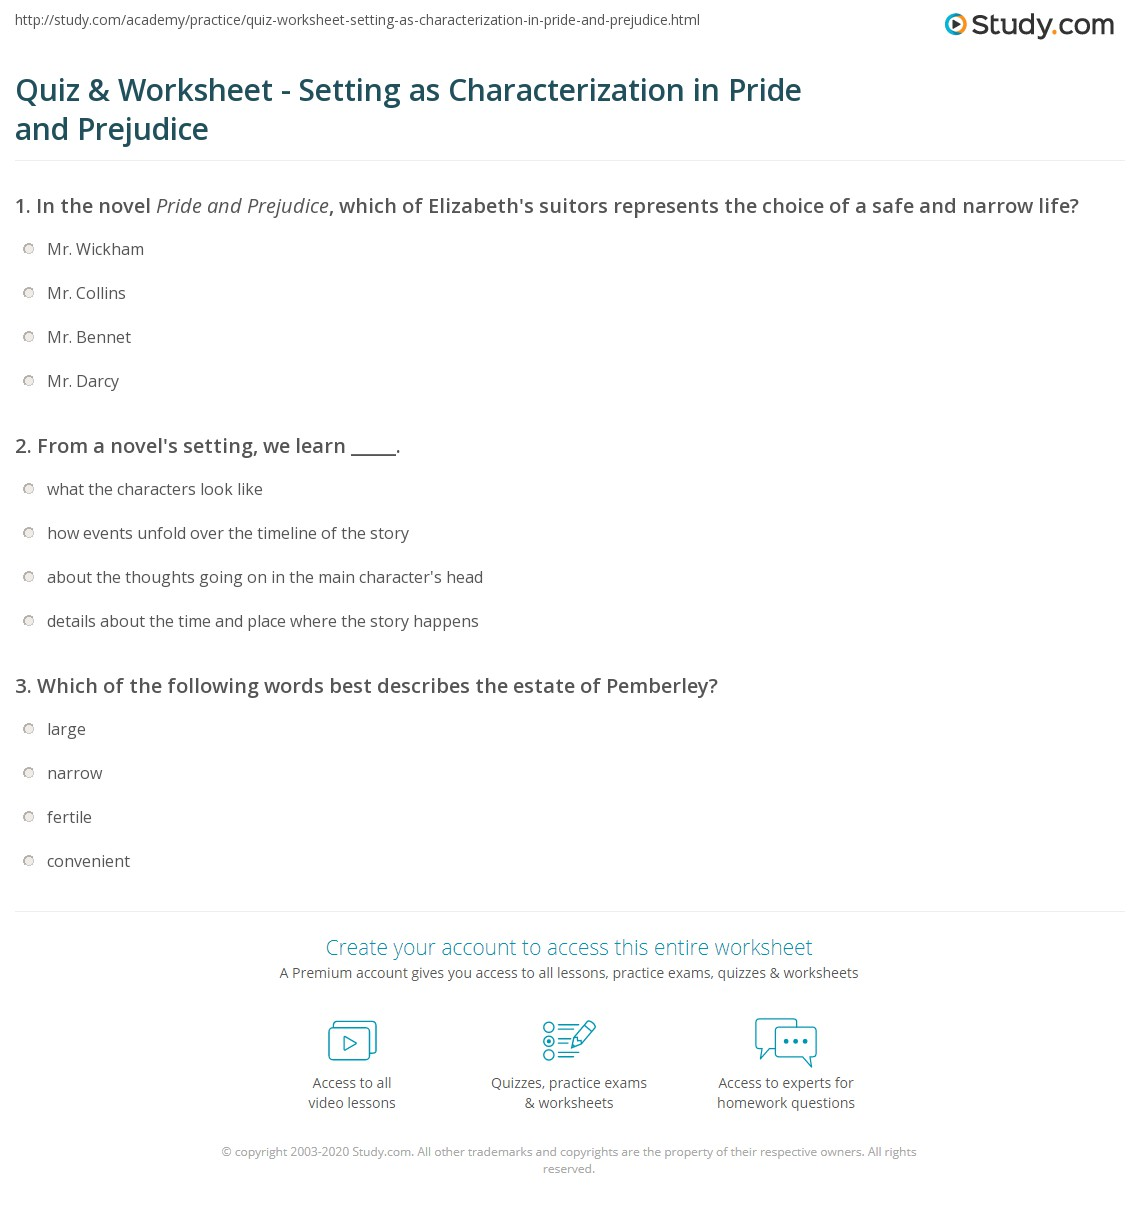 Free Worksheet Characterization Worksheet quiz worksheet setting as characterization in pride and print prejudice worksheet